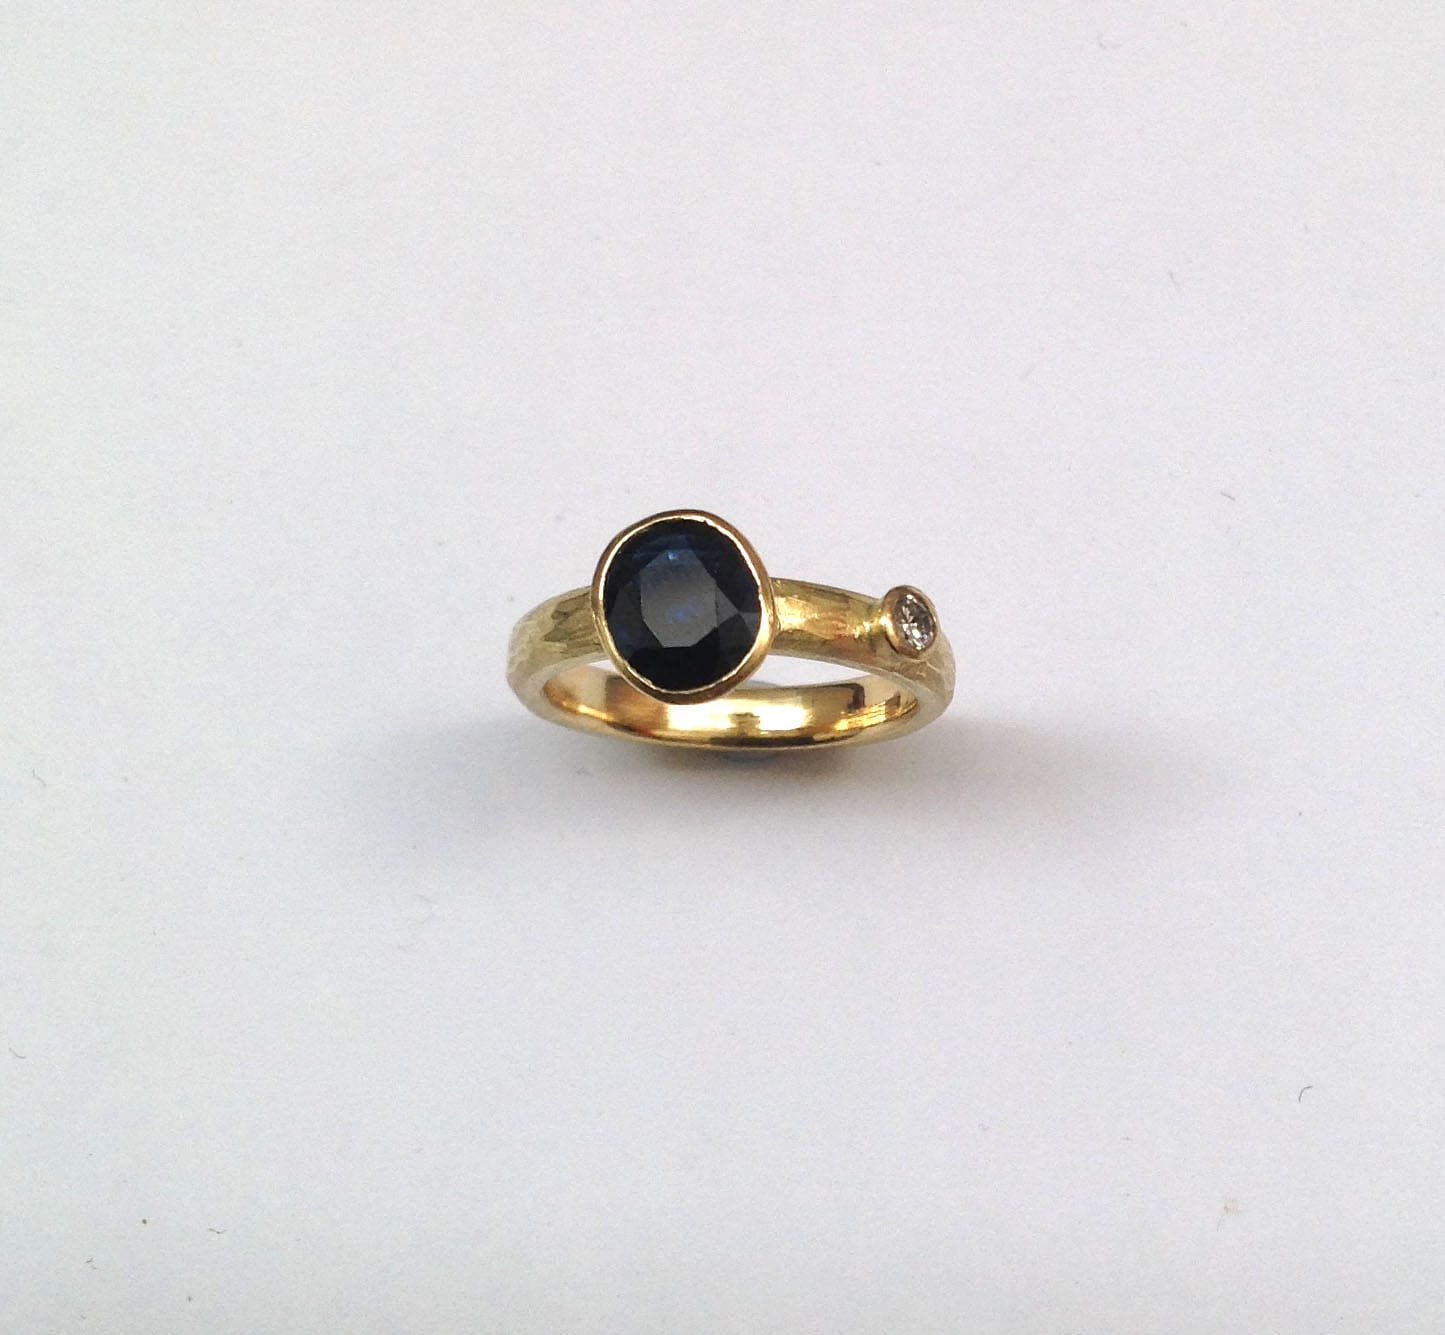 Engagement ring 18 carat gold, blue sapphire, brilliant cut diamond